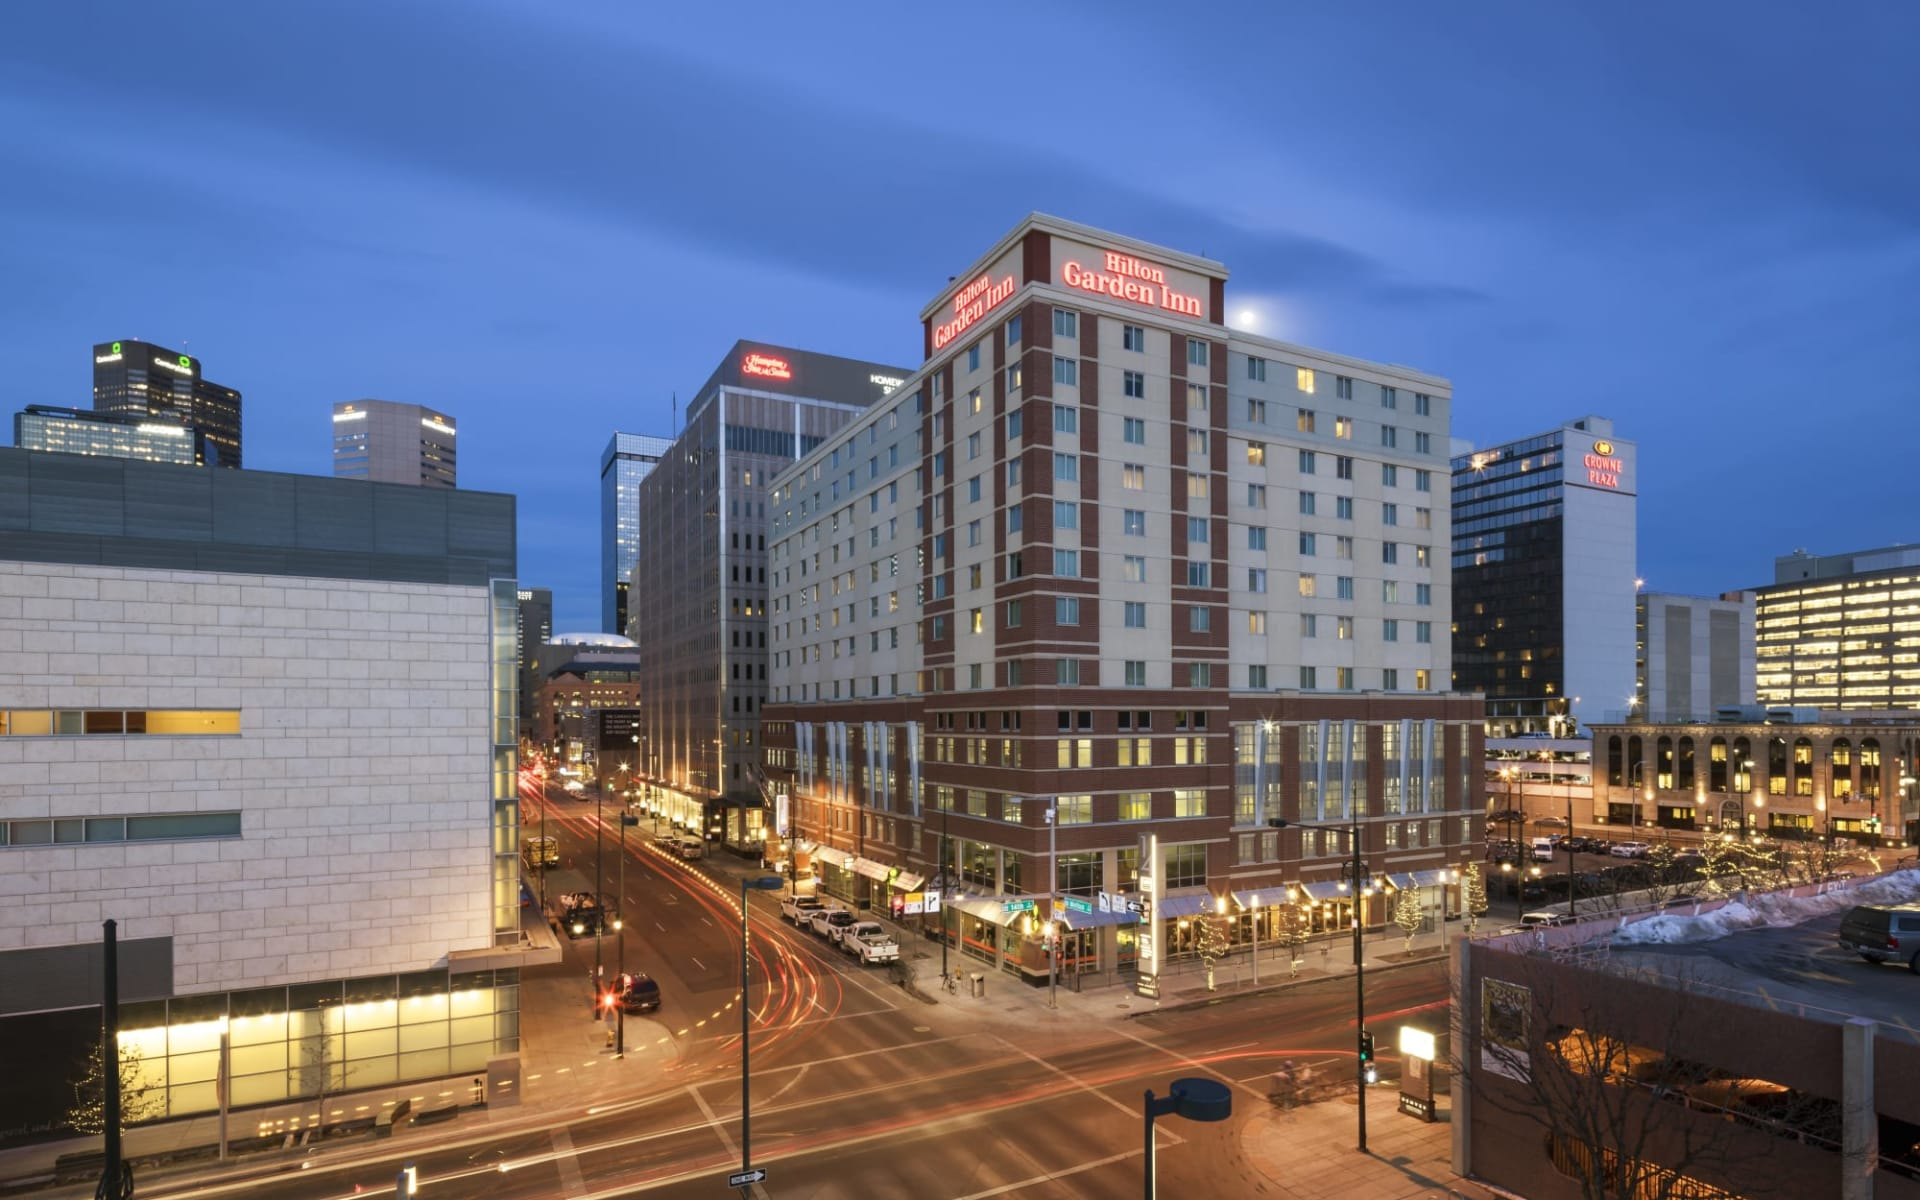 Hilton Garden Inn Denver Downtown:  Hilton Garden Inn Denver Downtown - Exterior